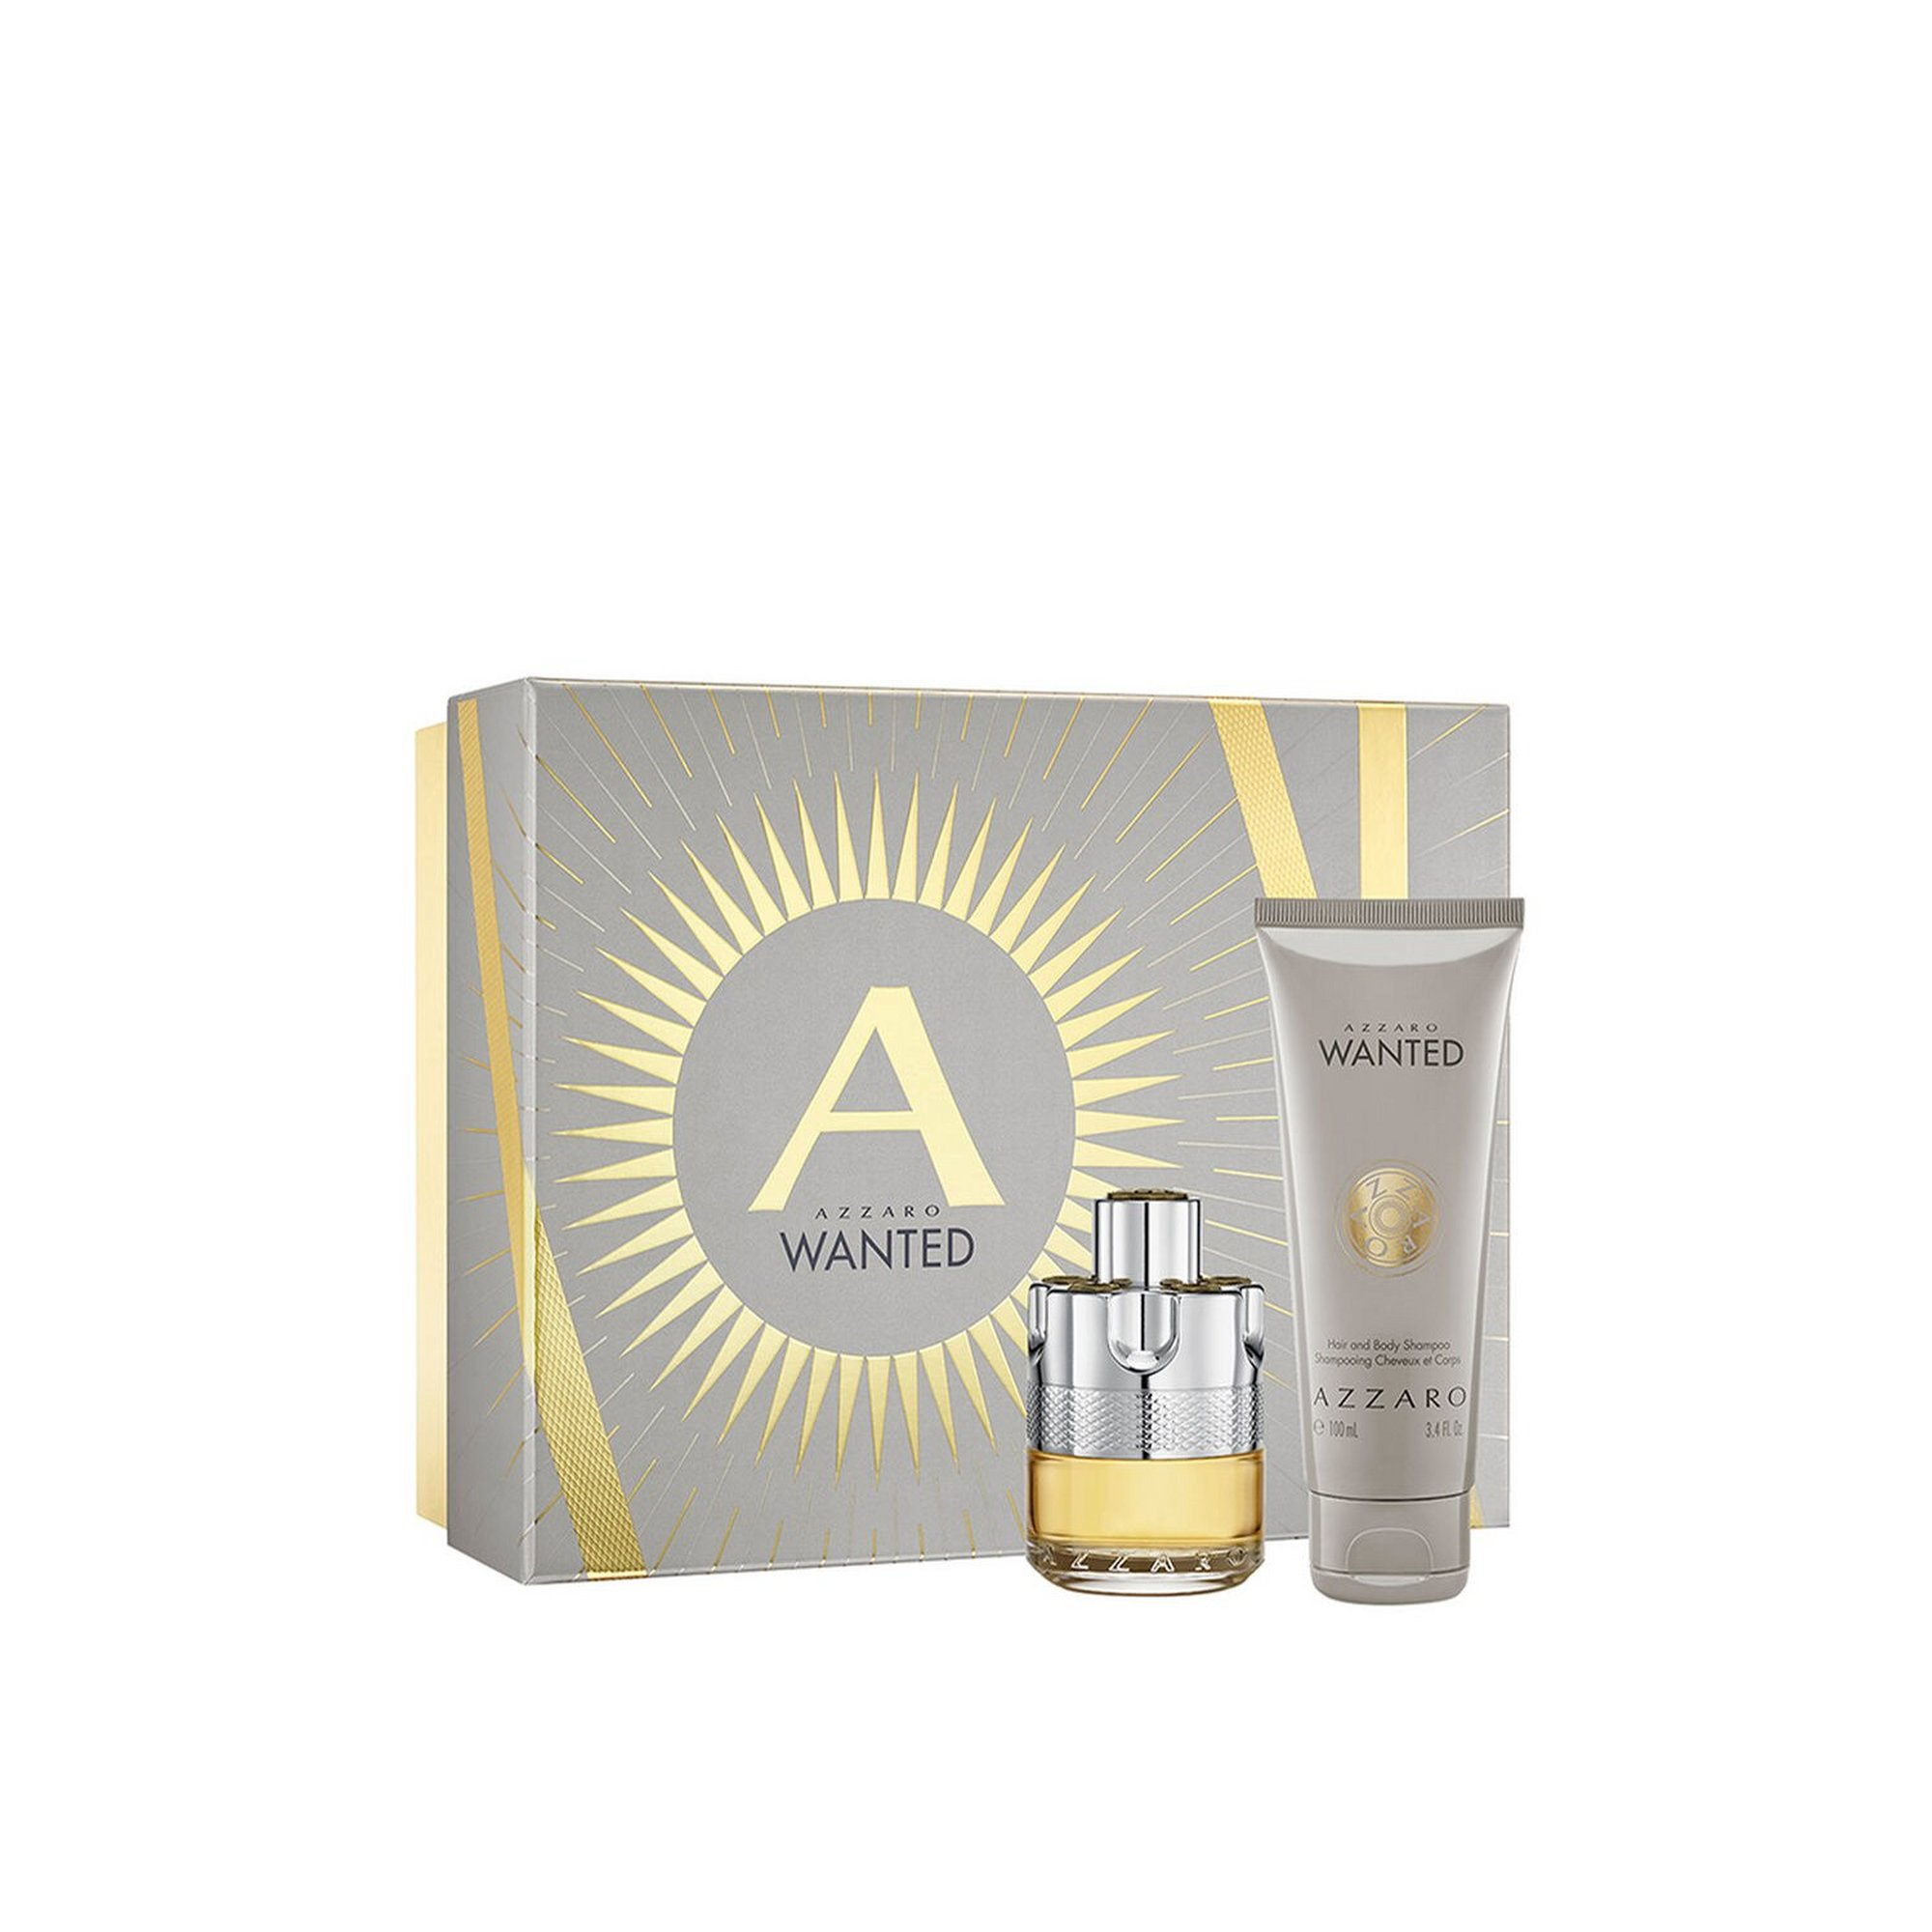 Image of Azzaro Wanted 50ml EDT Gift Set